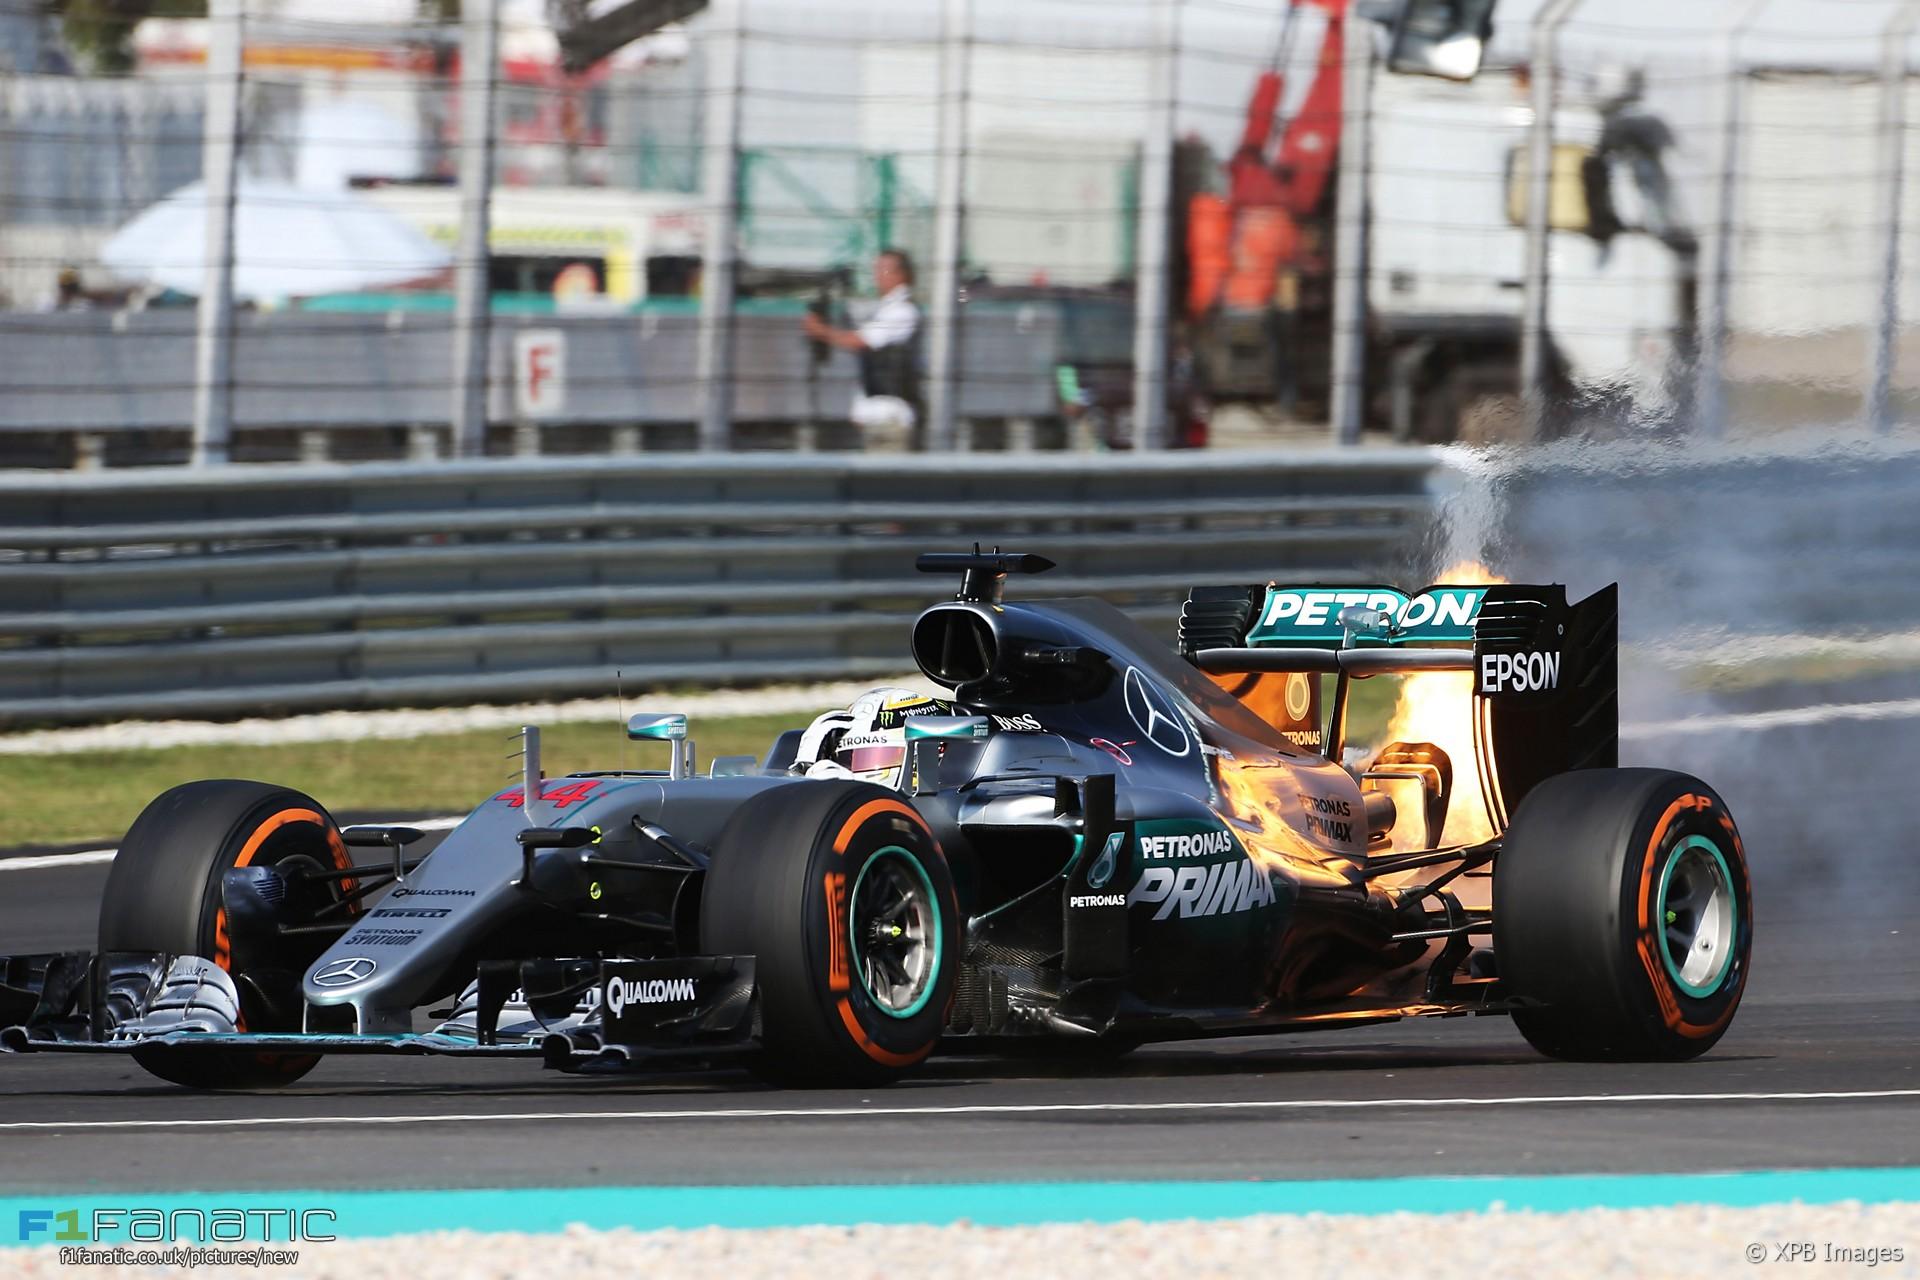 Lewis Hamilton, Mercedes, Sepang International Circuit, 2016